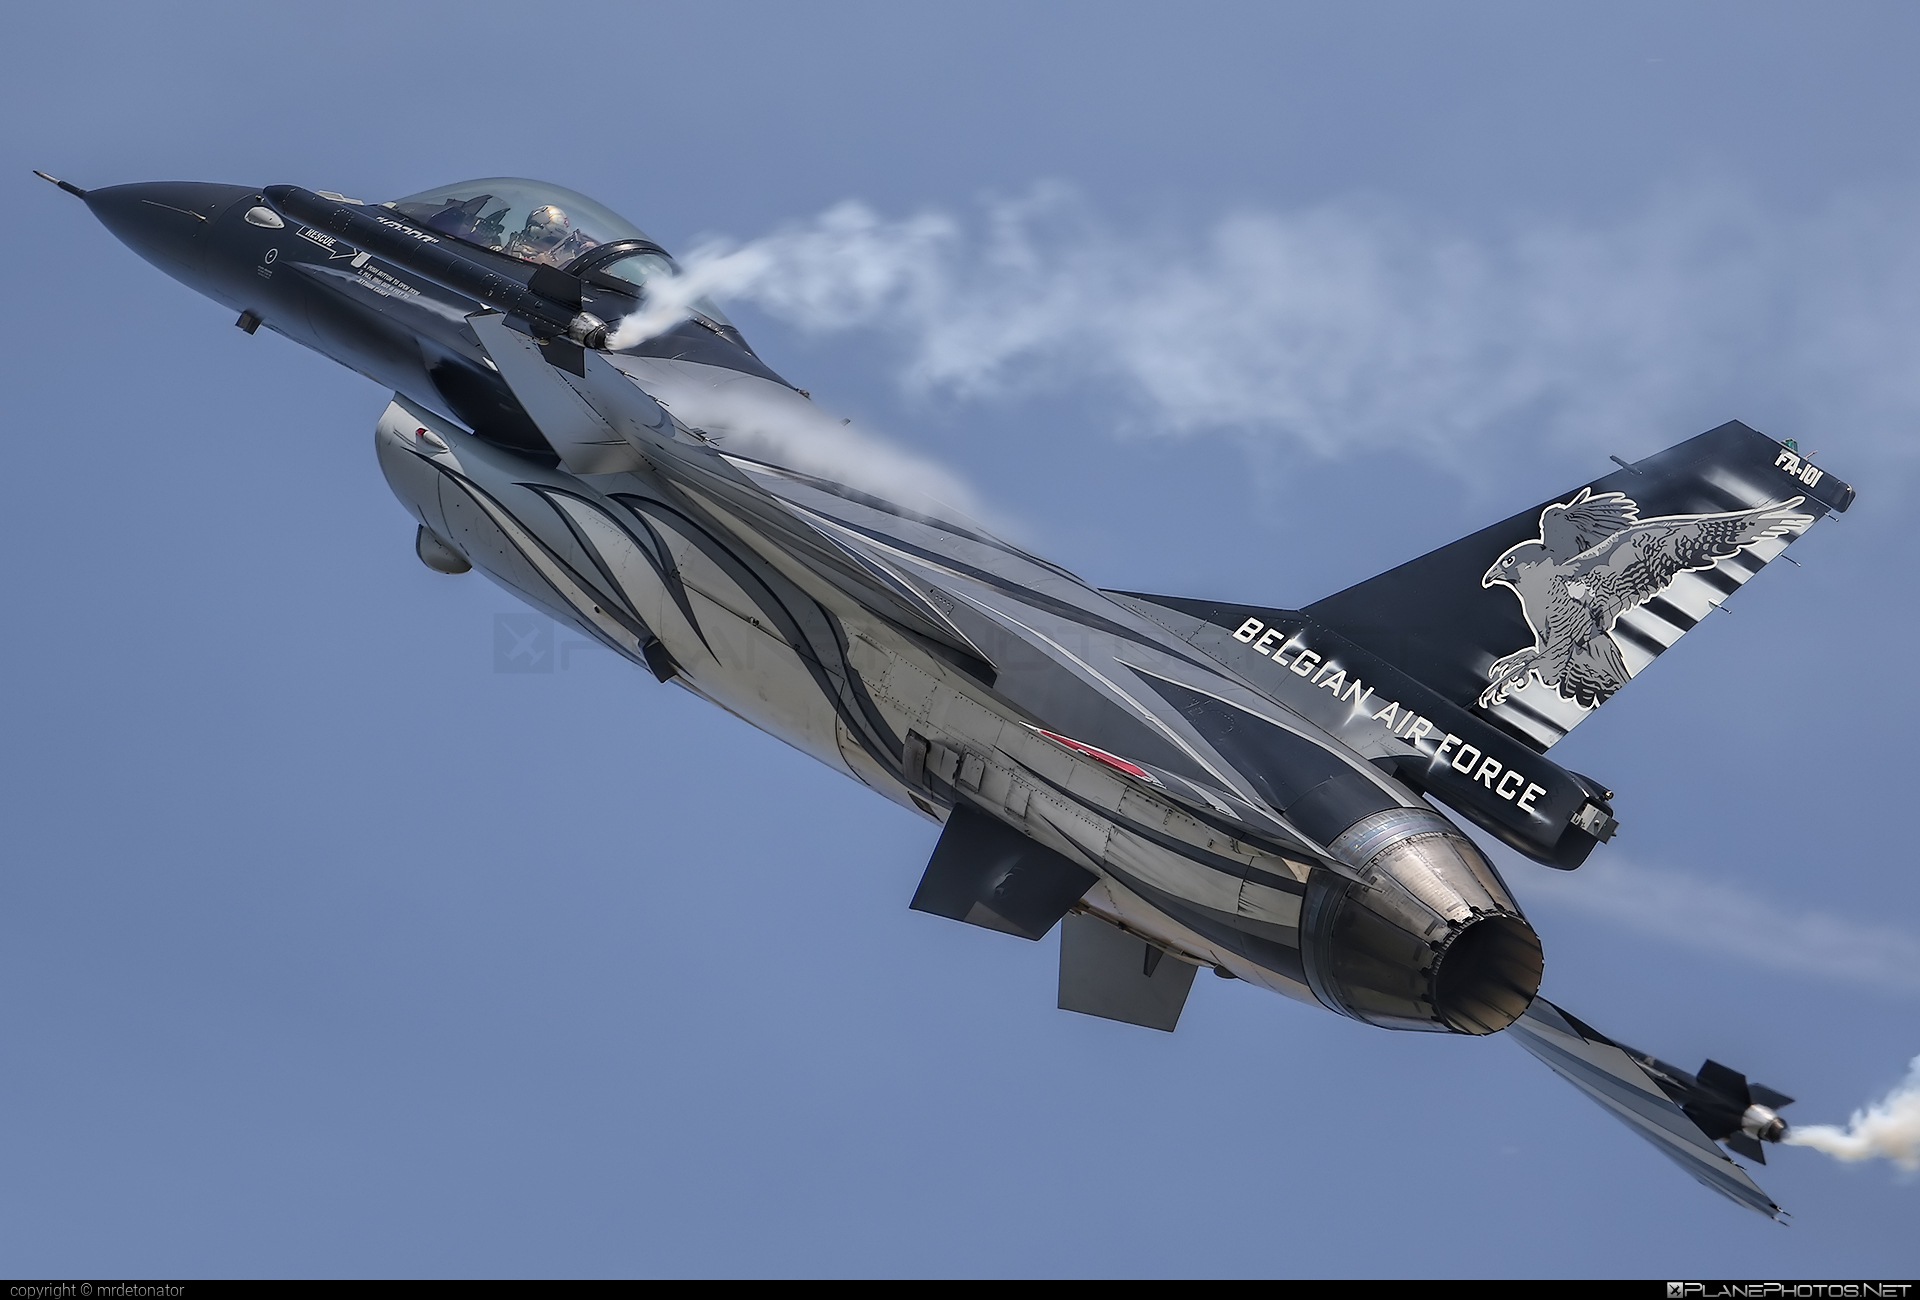 Luchtcomponent (Belgian Air Force) SABCA F-16AM Fighting Falcon - FA-101 #f16 #f16am #fightingfalcon #radomairshow2018 #sabca